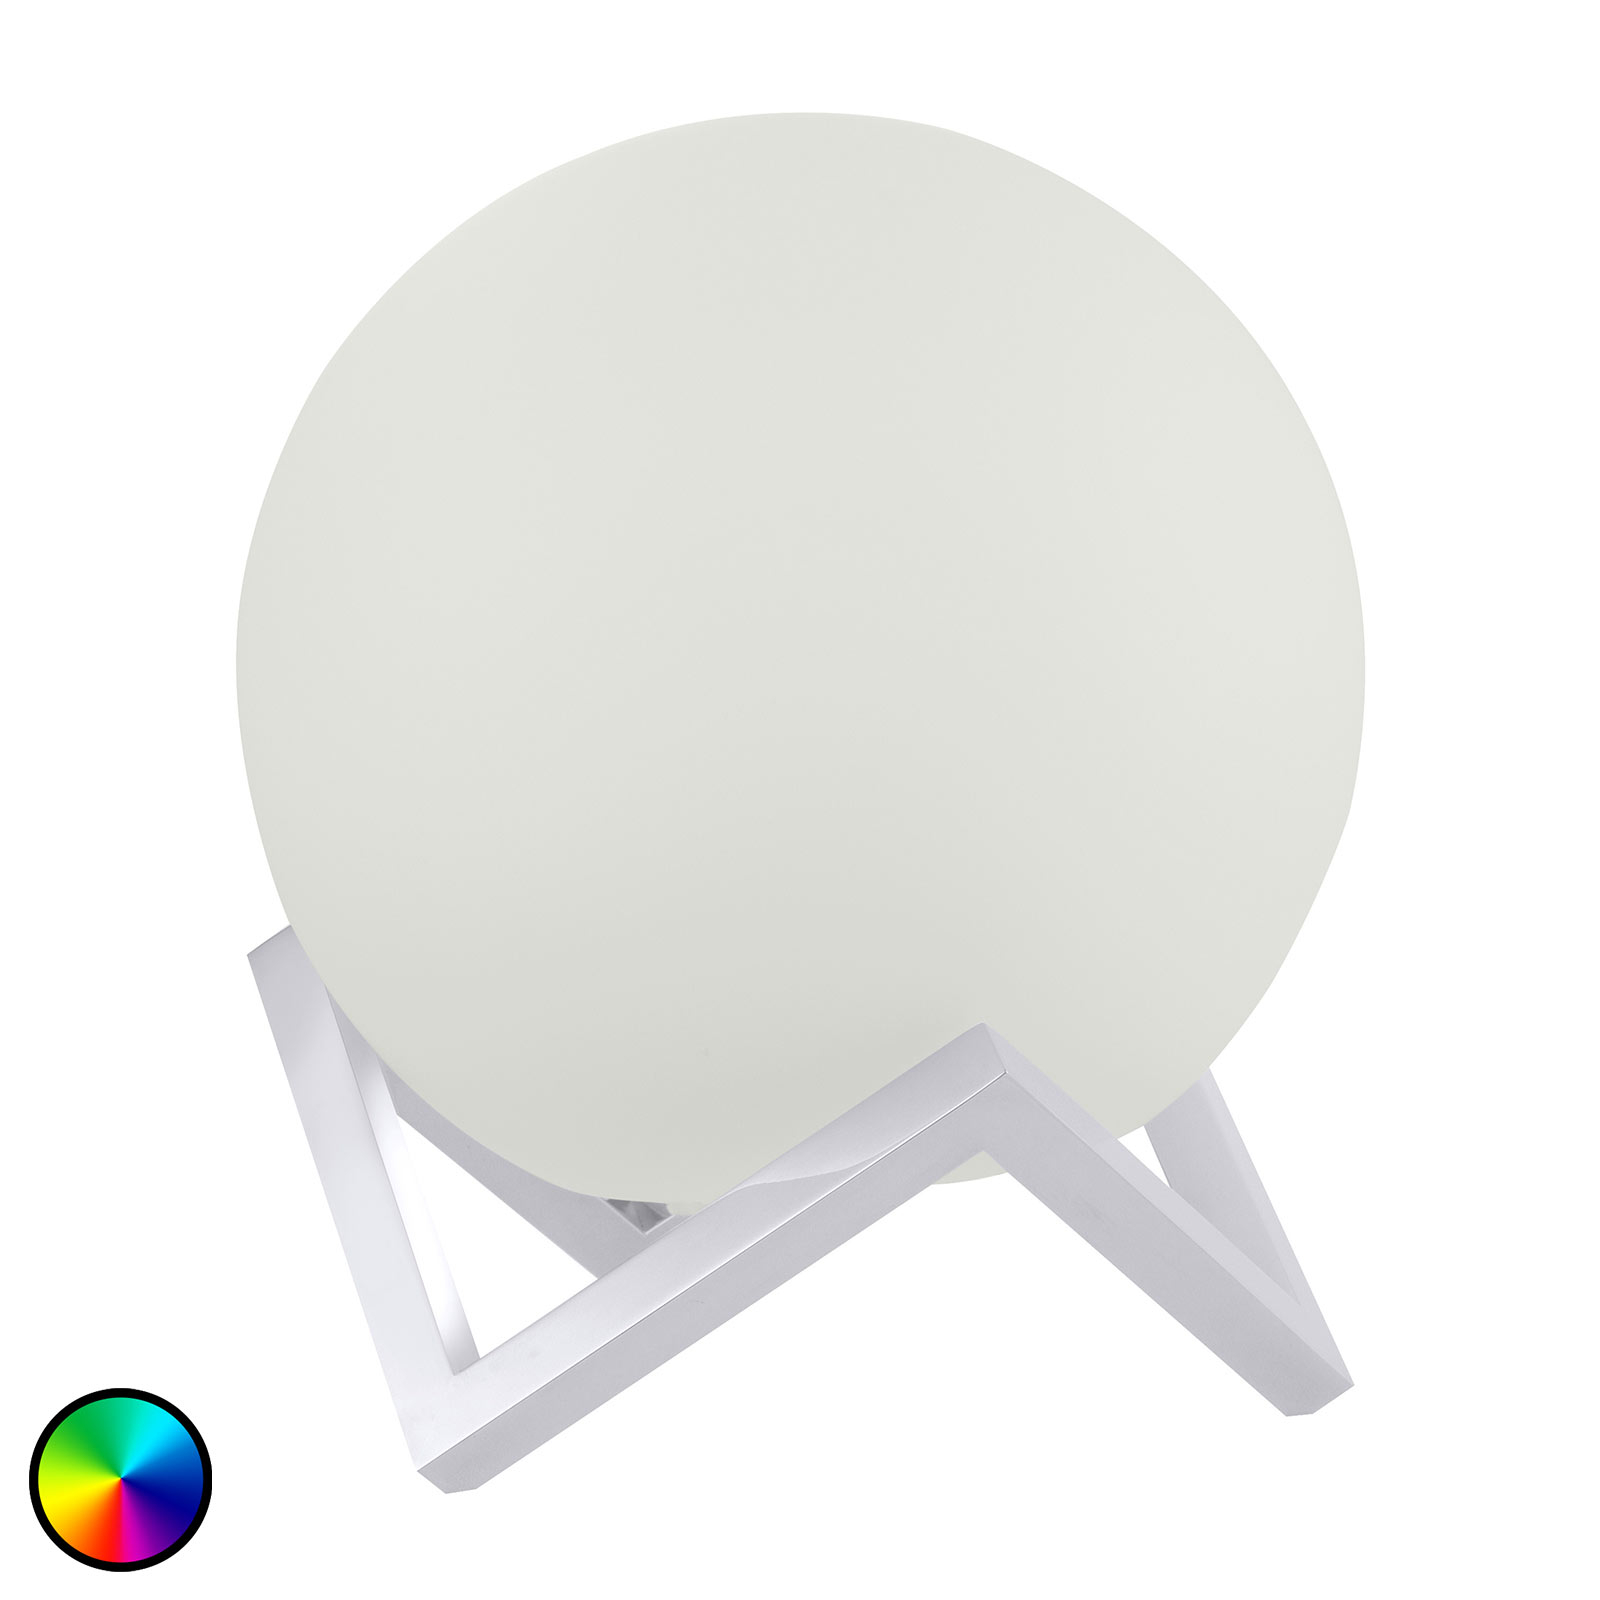 Paul Neuhaus Q-MANUEL LED-Tischleuchte RGBW CCT